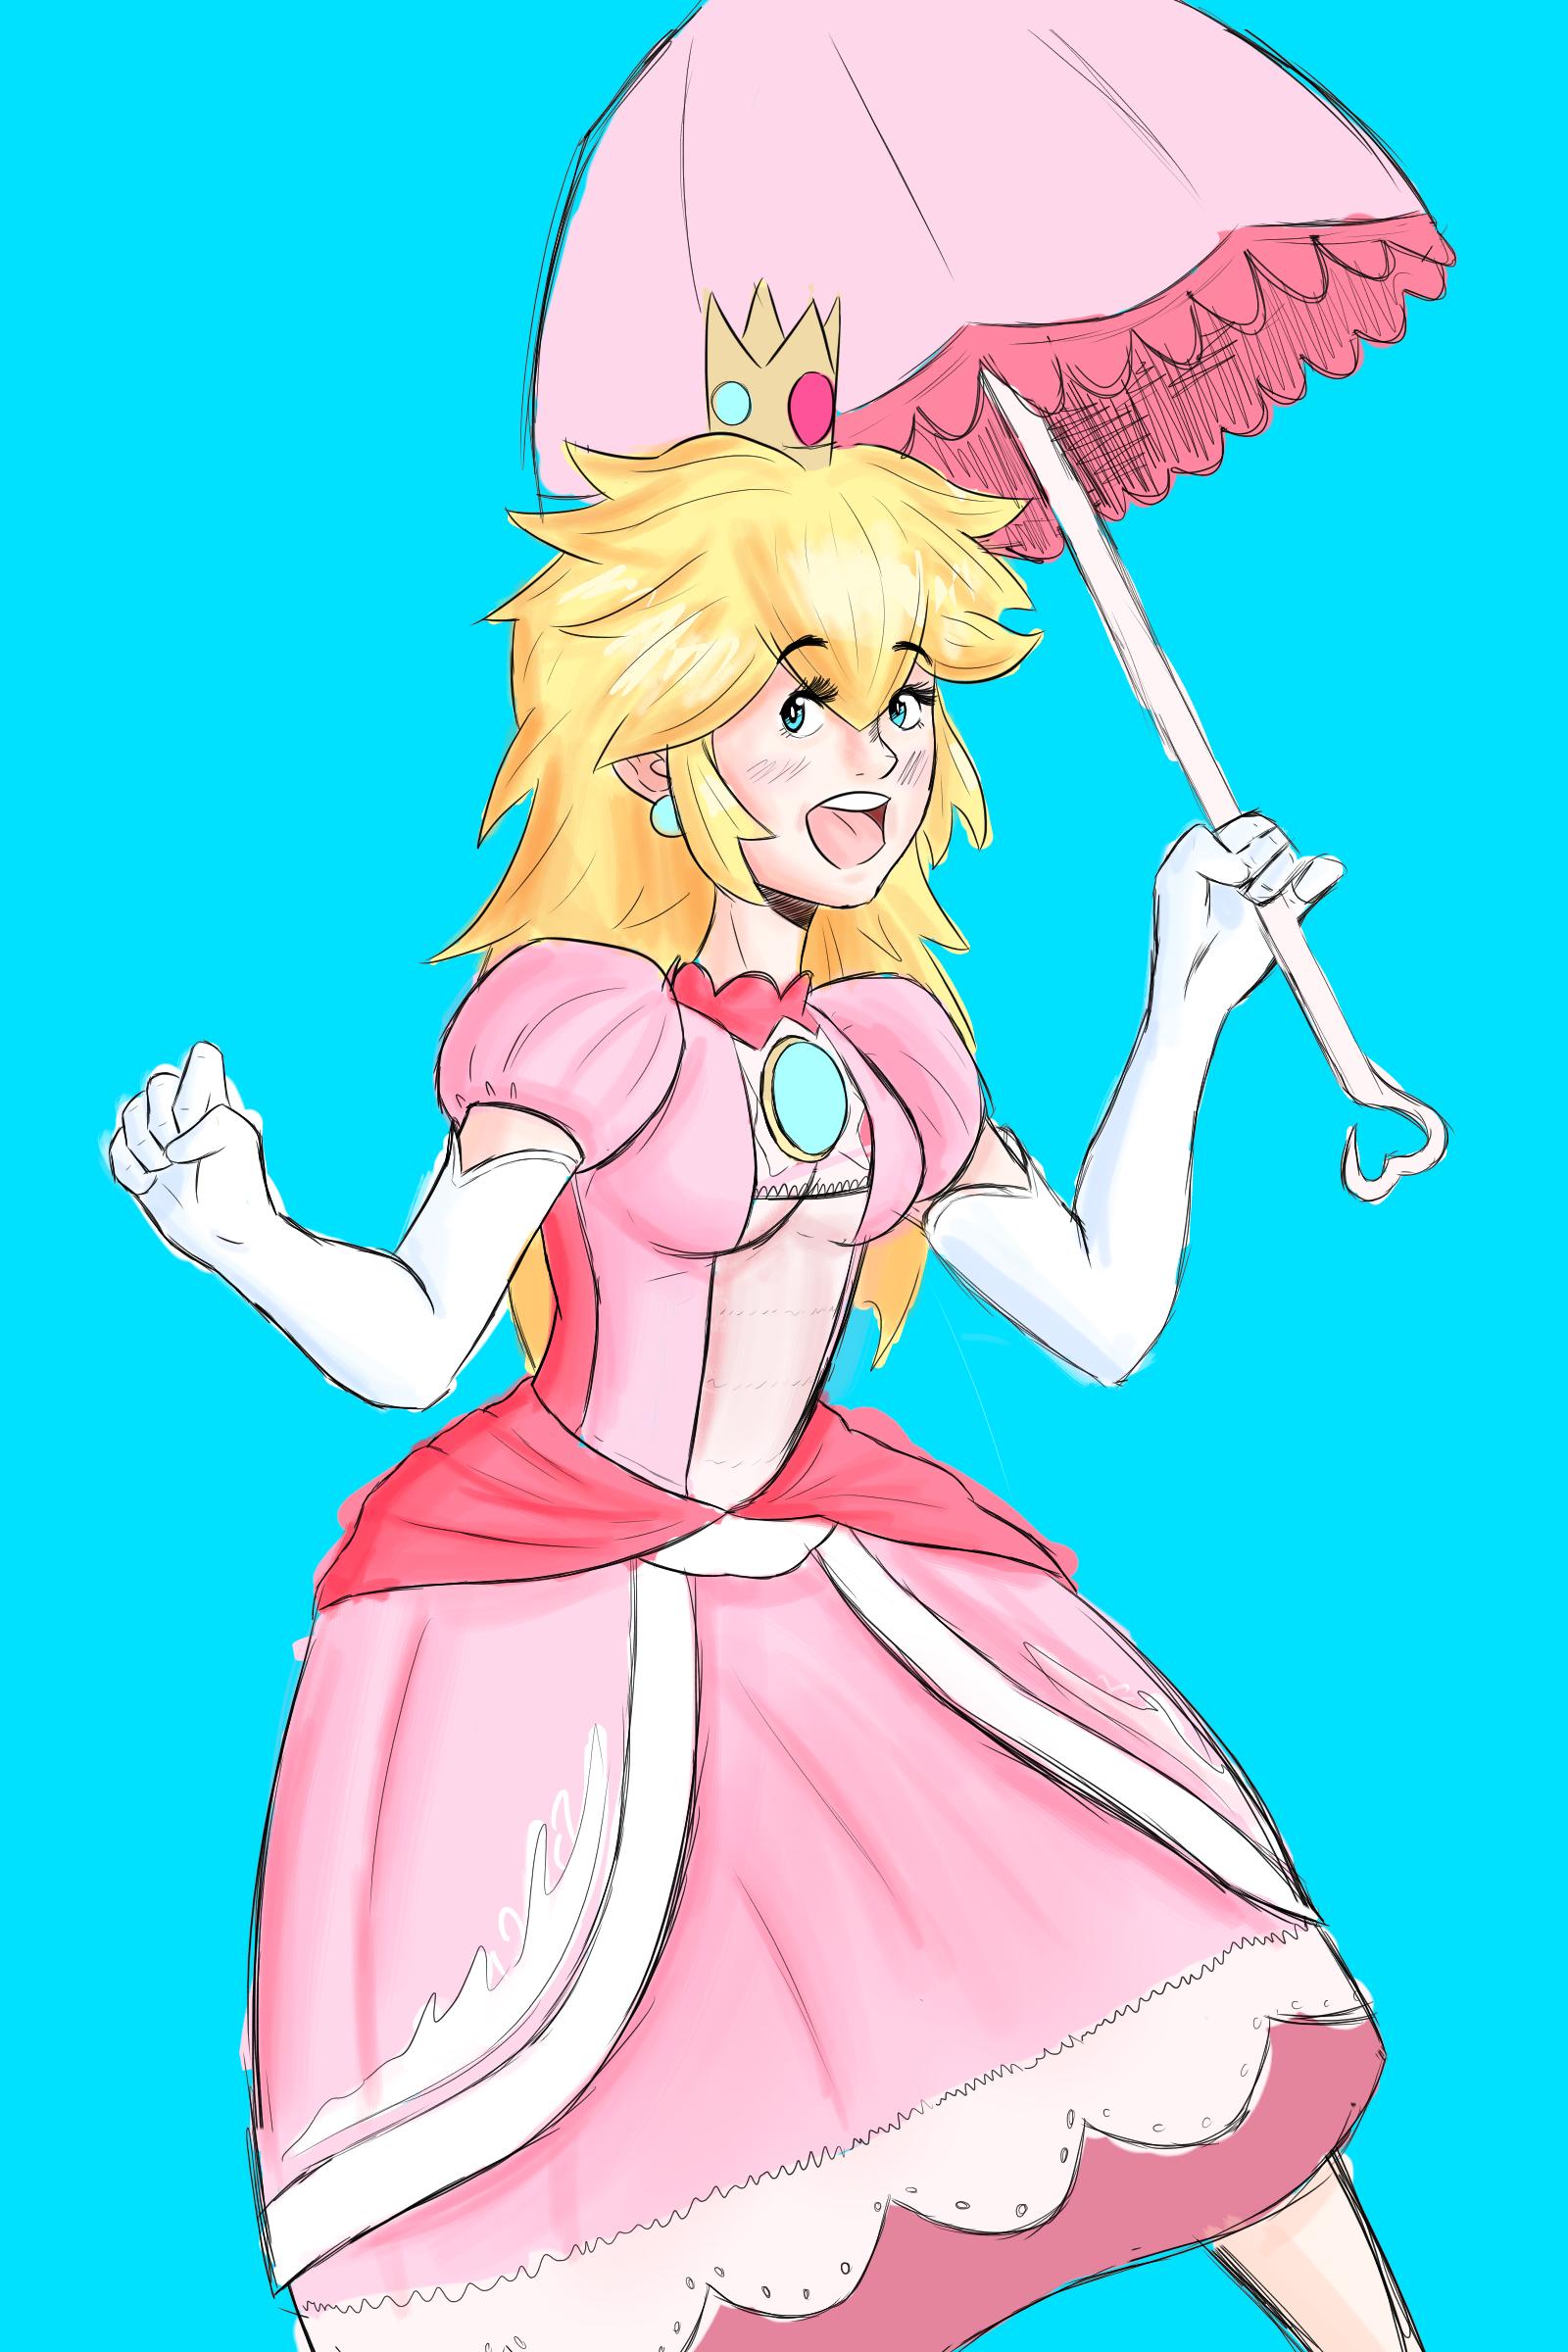 Coloured Peach sketch